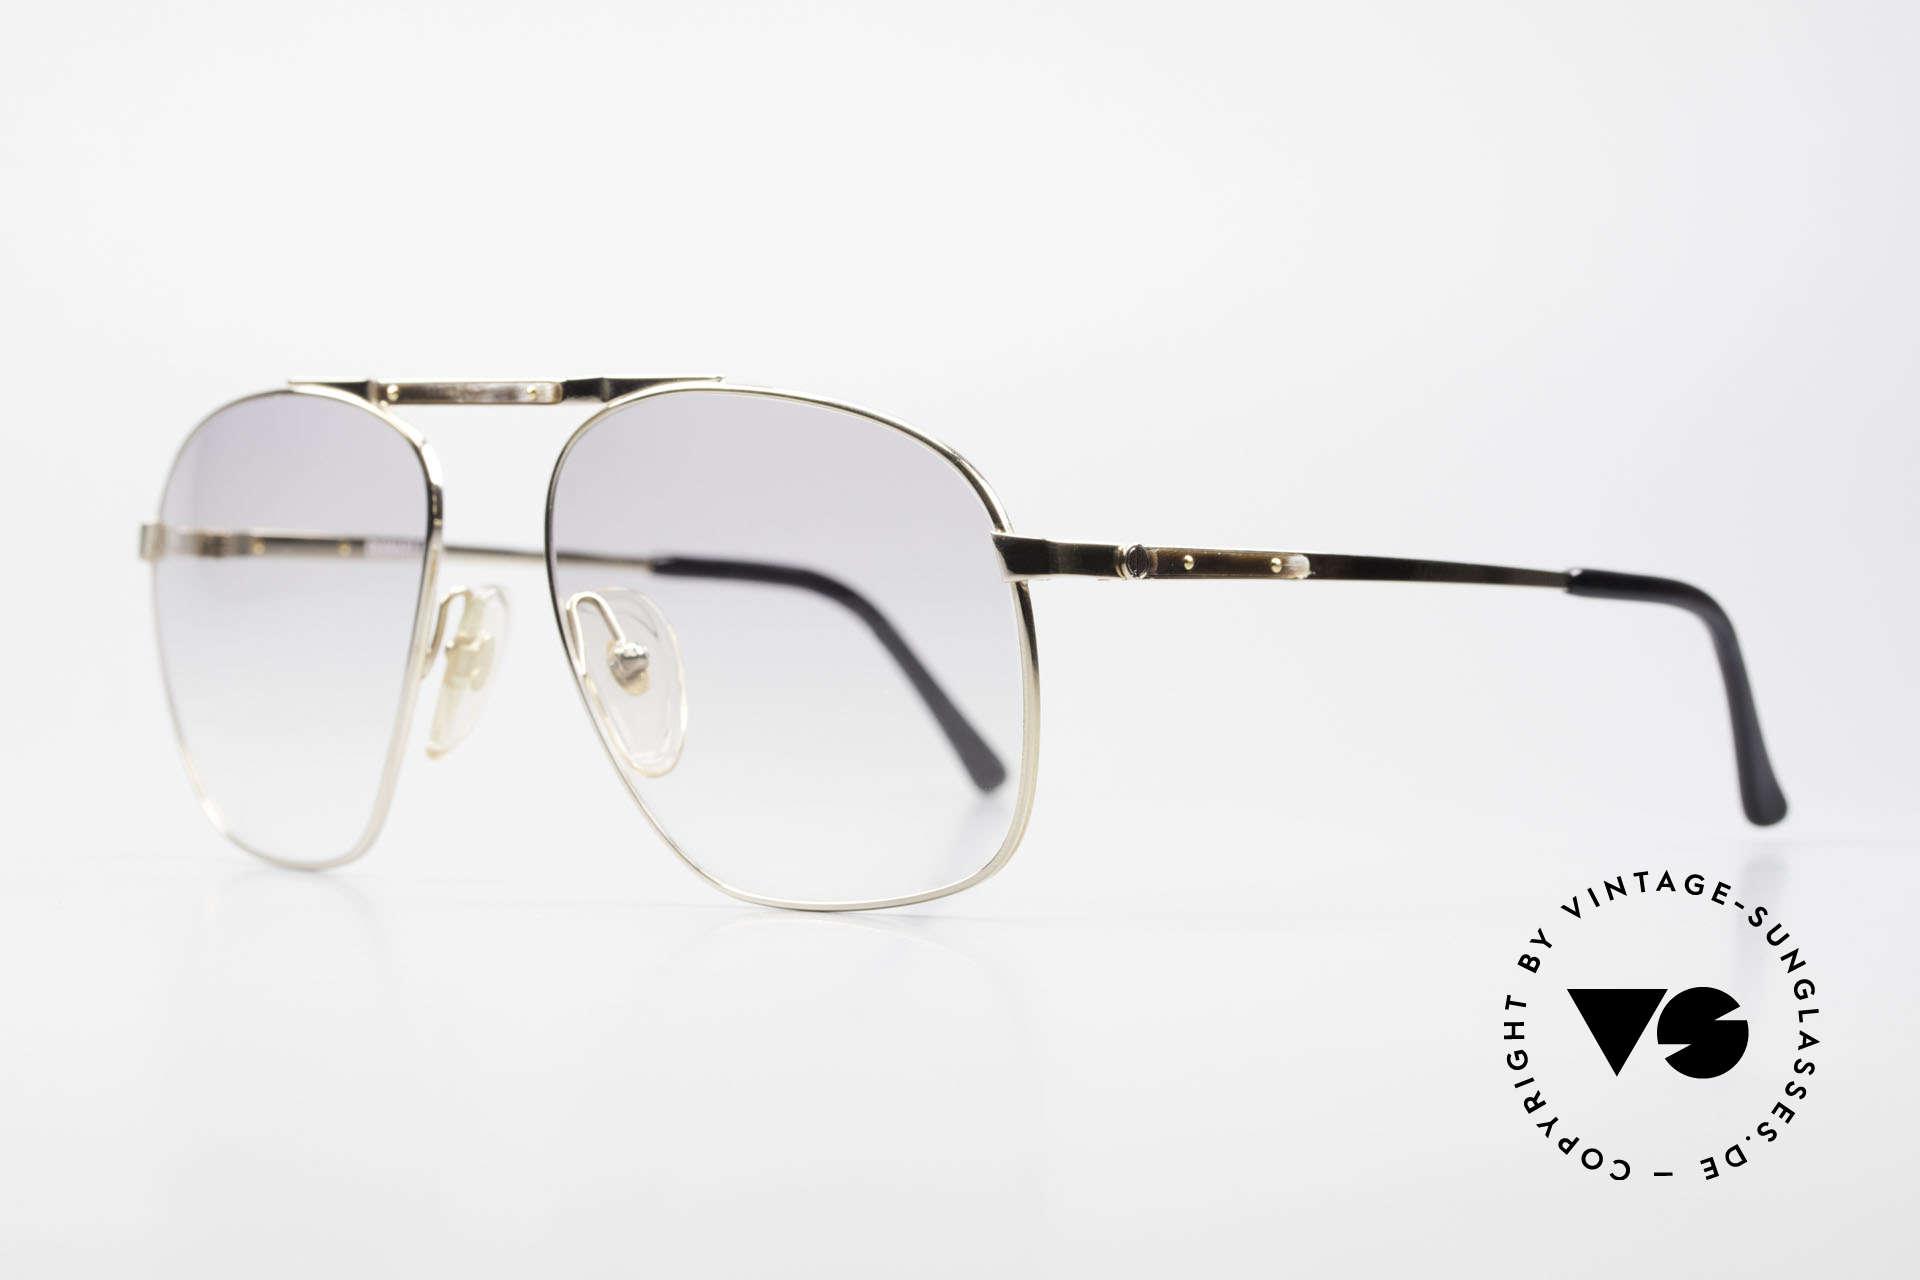 Dunhill 6046 80's Frame With Horn Appliqué, gold-plated metal frame with discreet horn appliqué, Made for Men